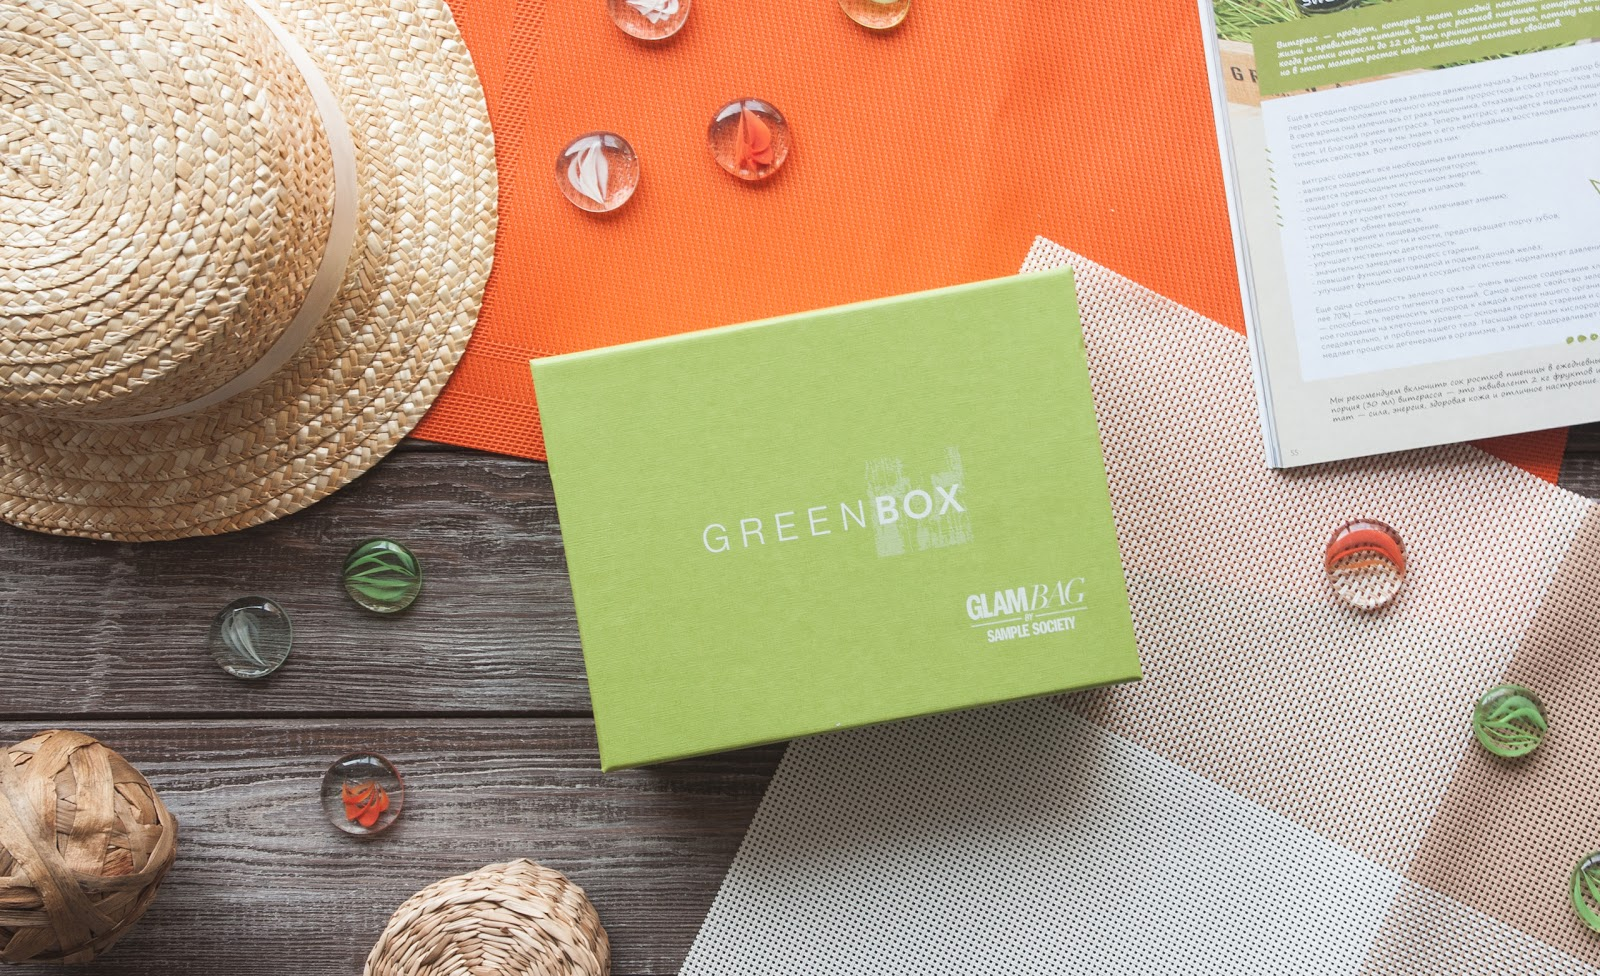 http://www.recklessdiary.ru/2017/09/green-box-glamour-box-naturalnaya-organicheskaya-kosmetika.html